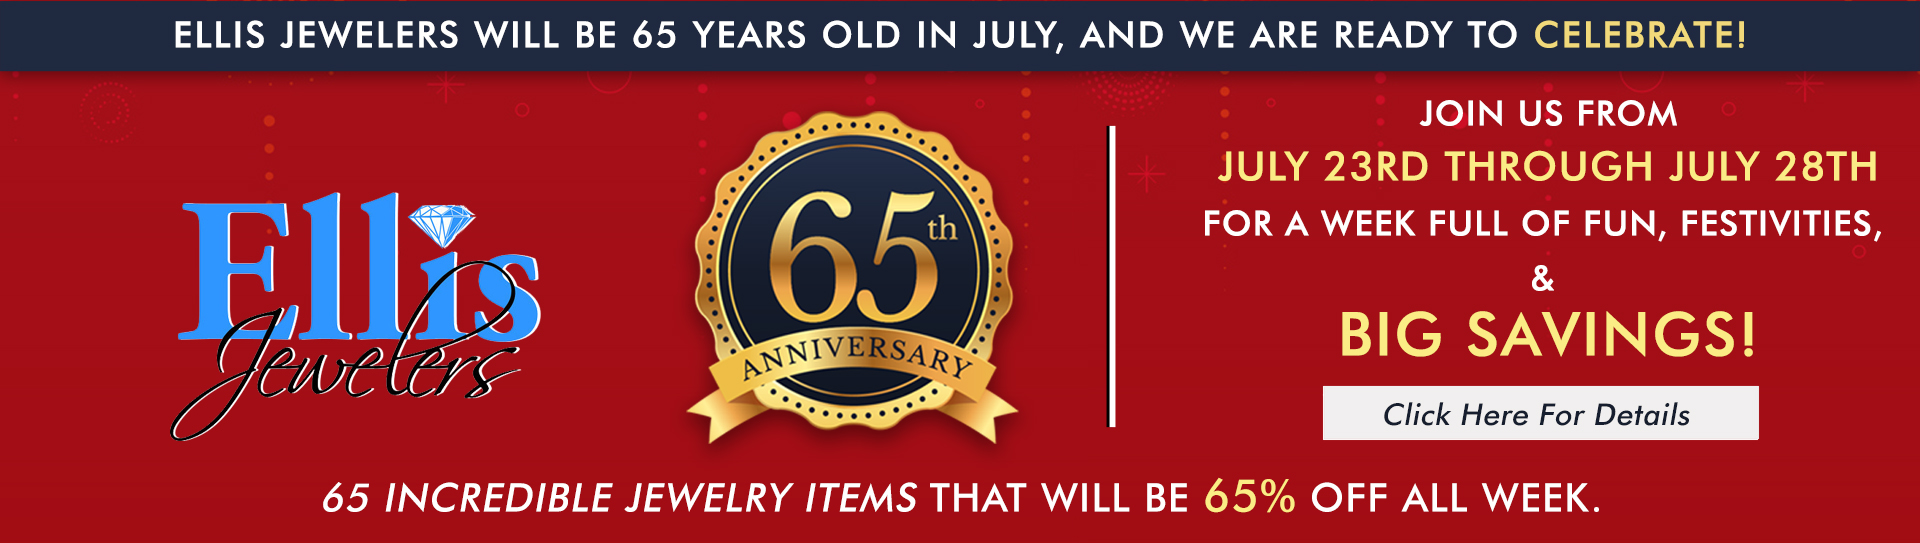 65th Anniversary Event